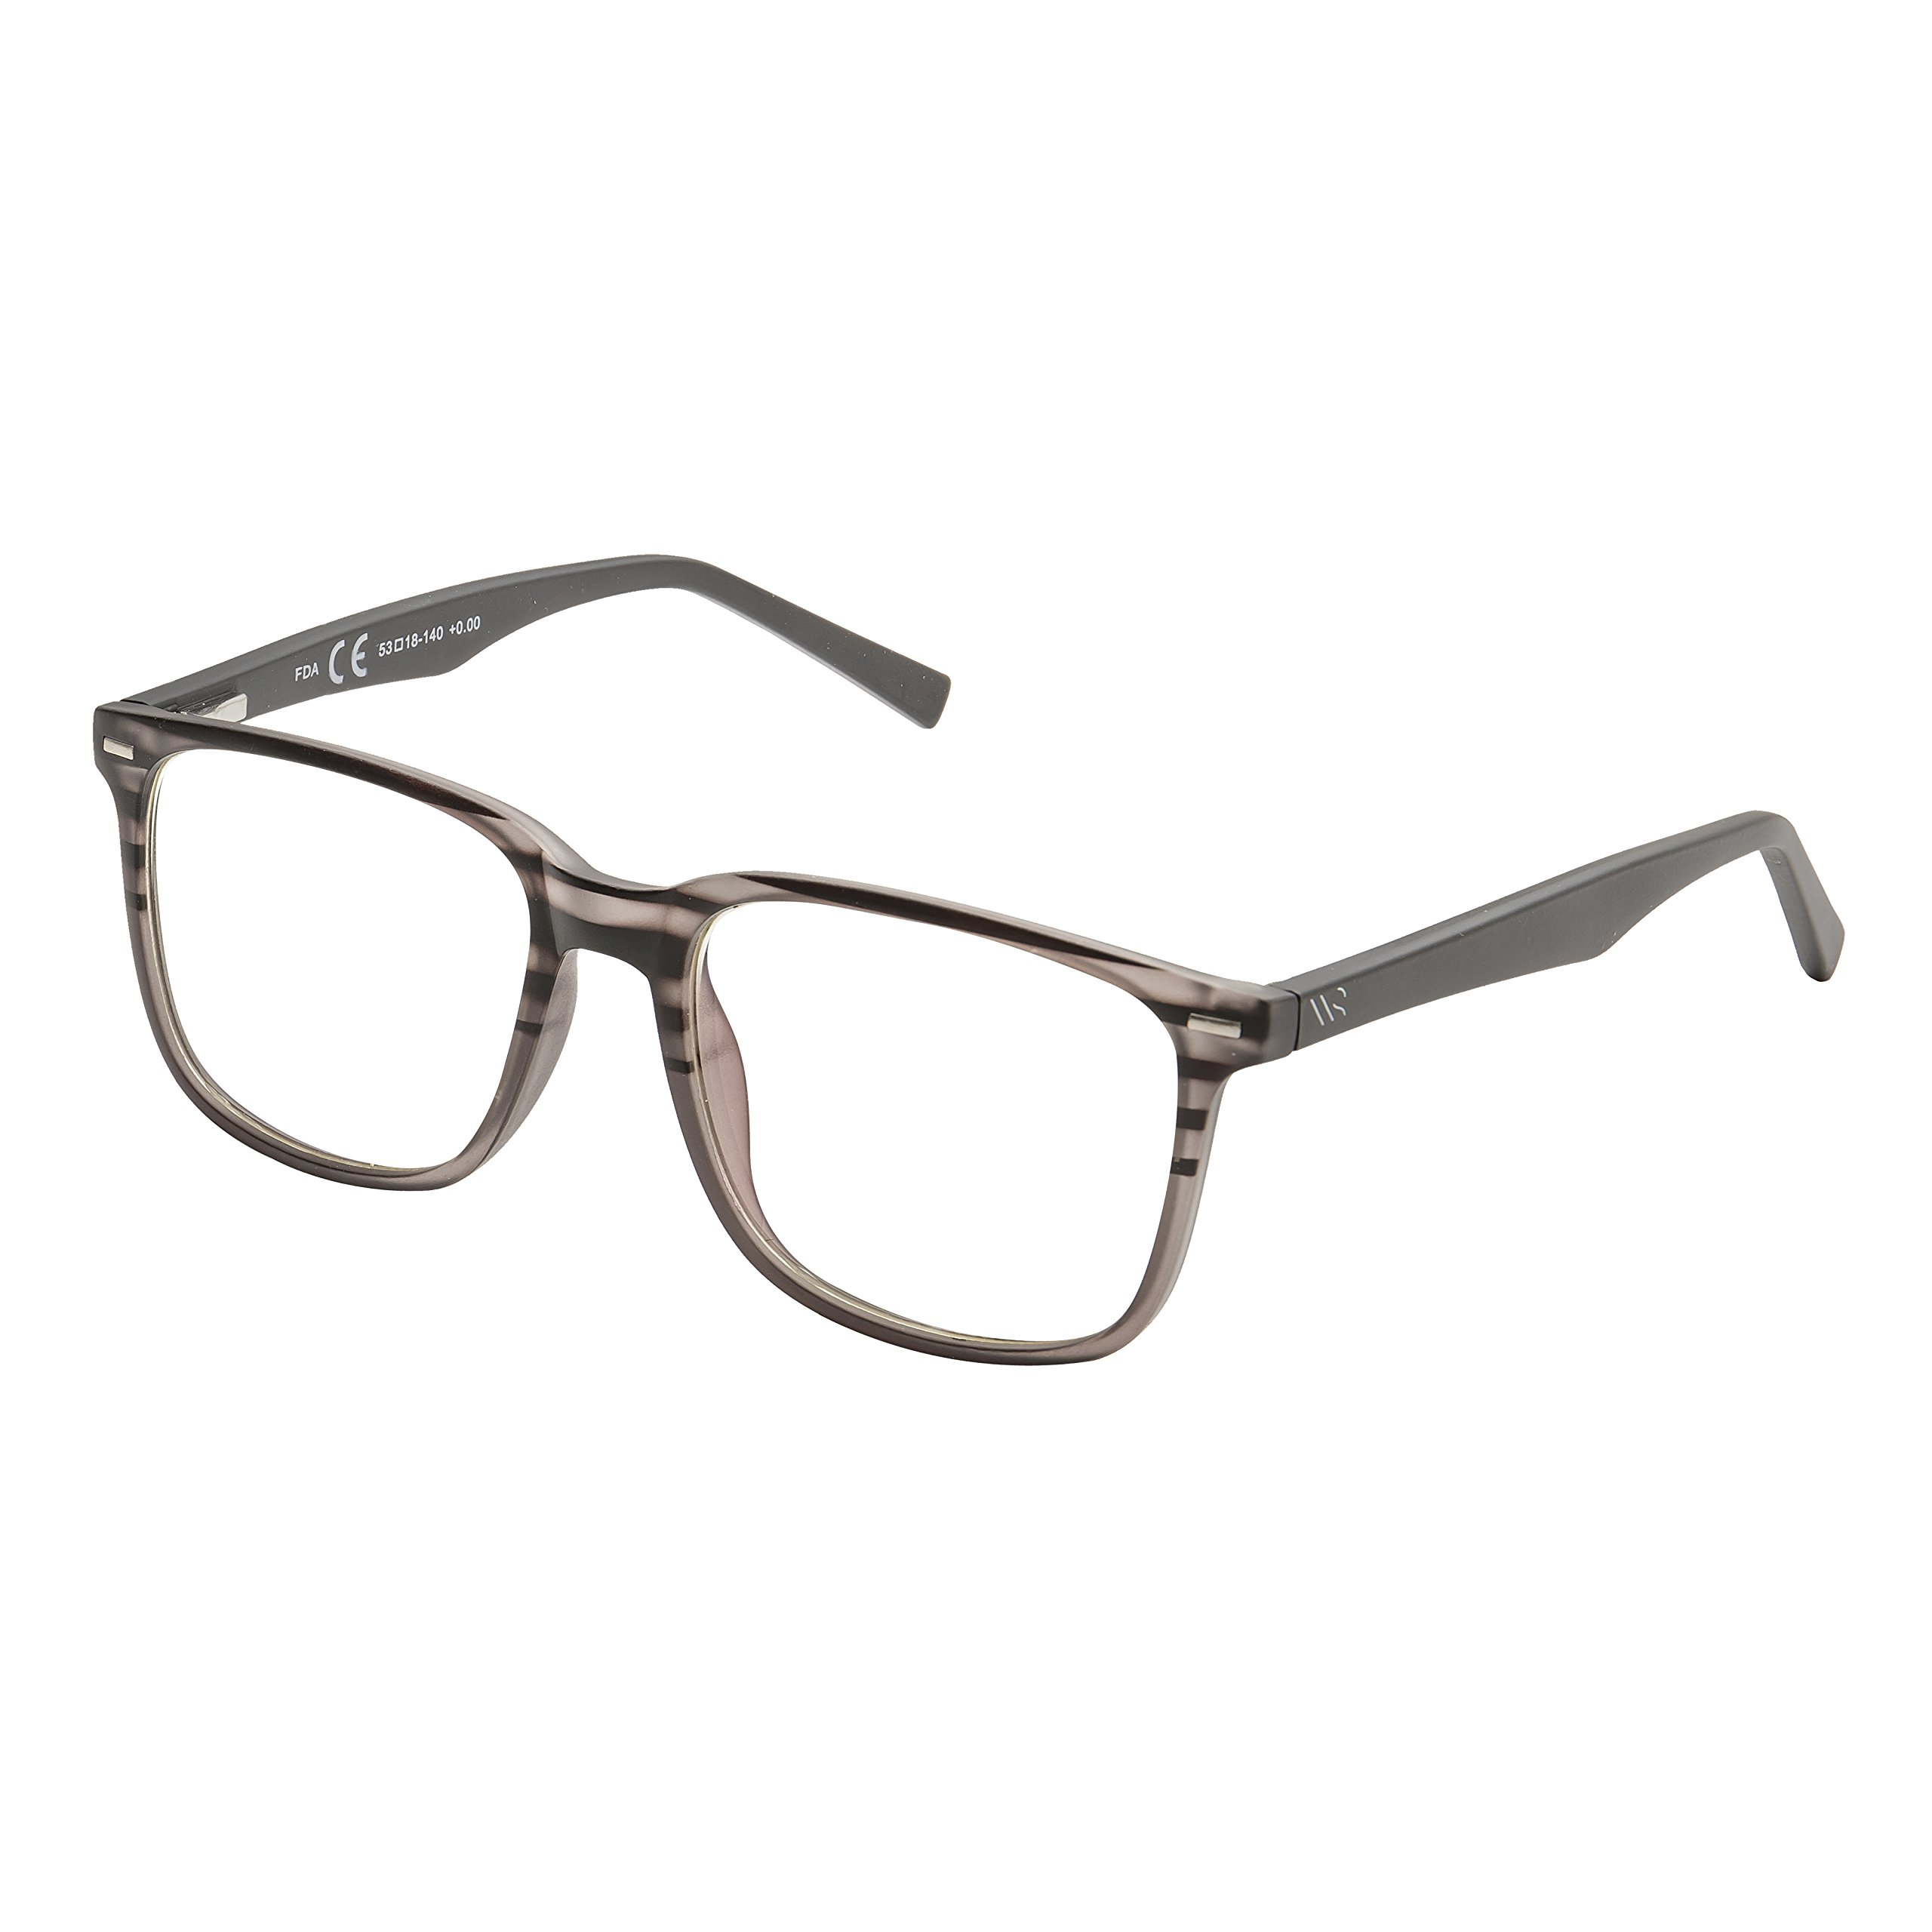 Blue Light Blocking Glasses,Cut UV400 Transparent Lens,Computer Reading Glasses,Anti Eyestrain/Anti Scratch/Anti Smudgy,Sleep Better for Women/Men (Grey, 0.00)